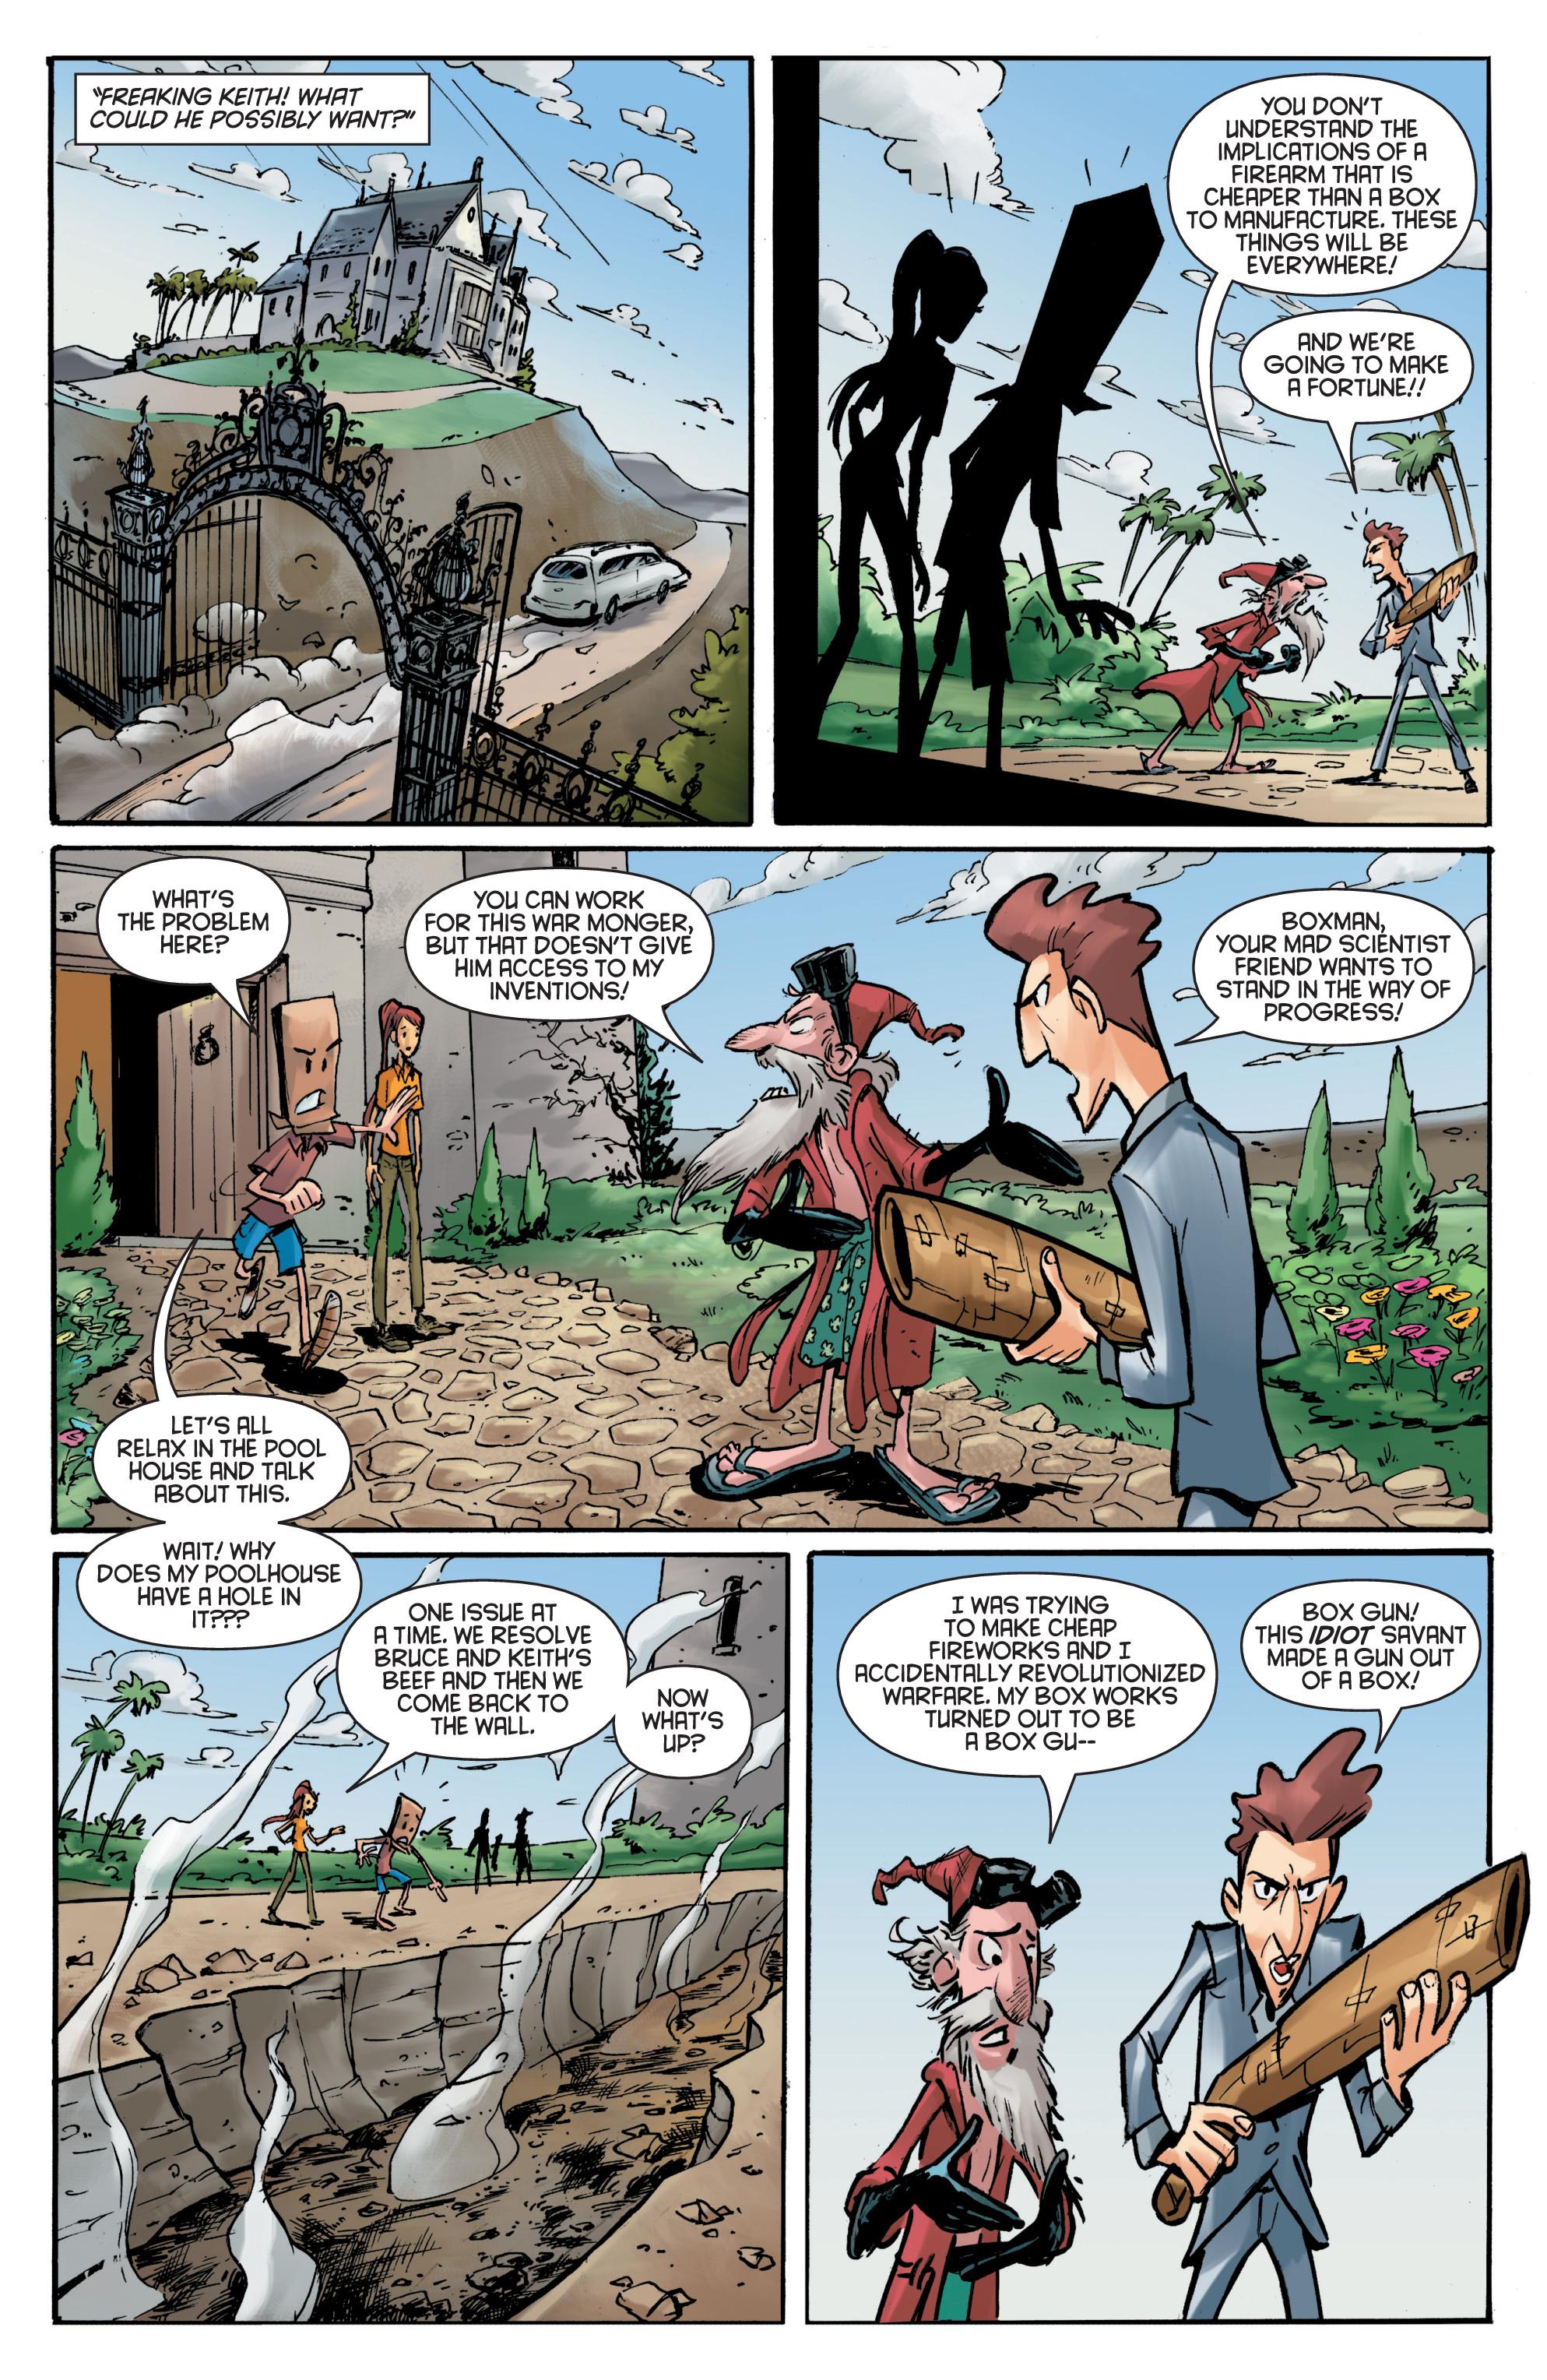 Read online Smosh comic -  Issue #5 - 17